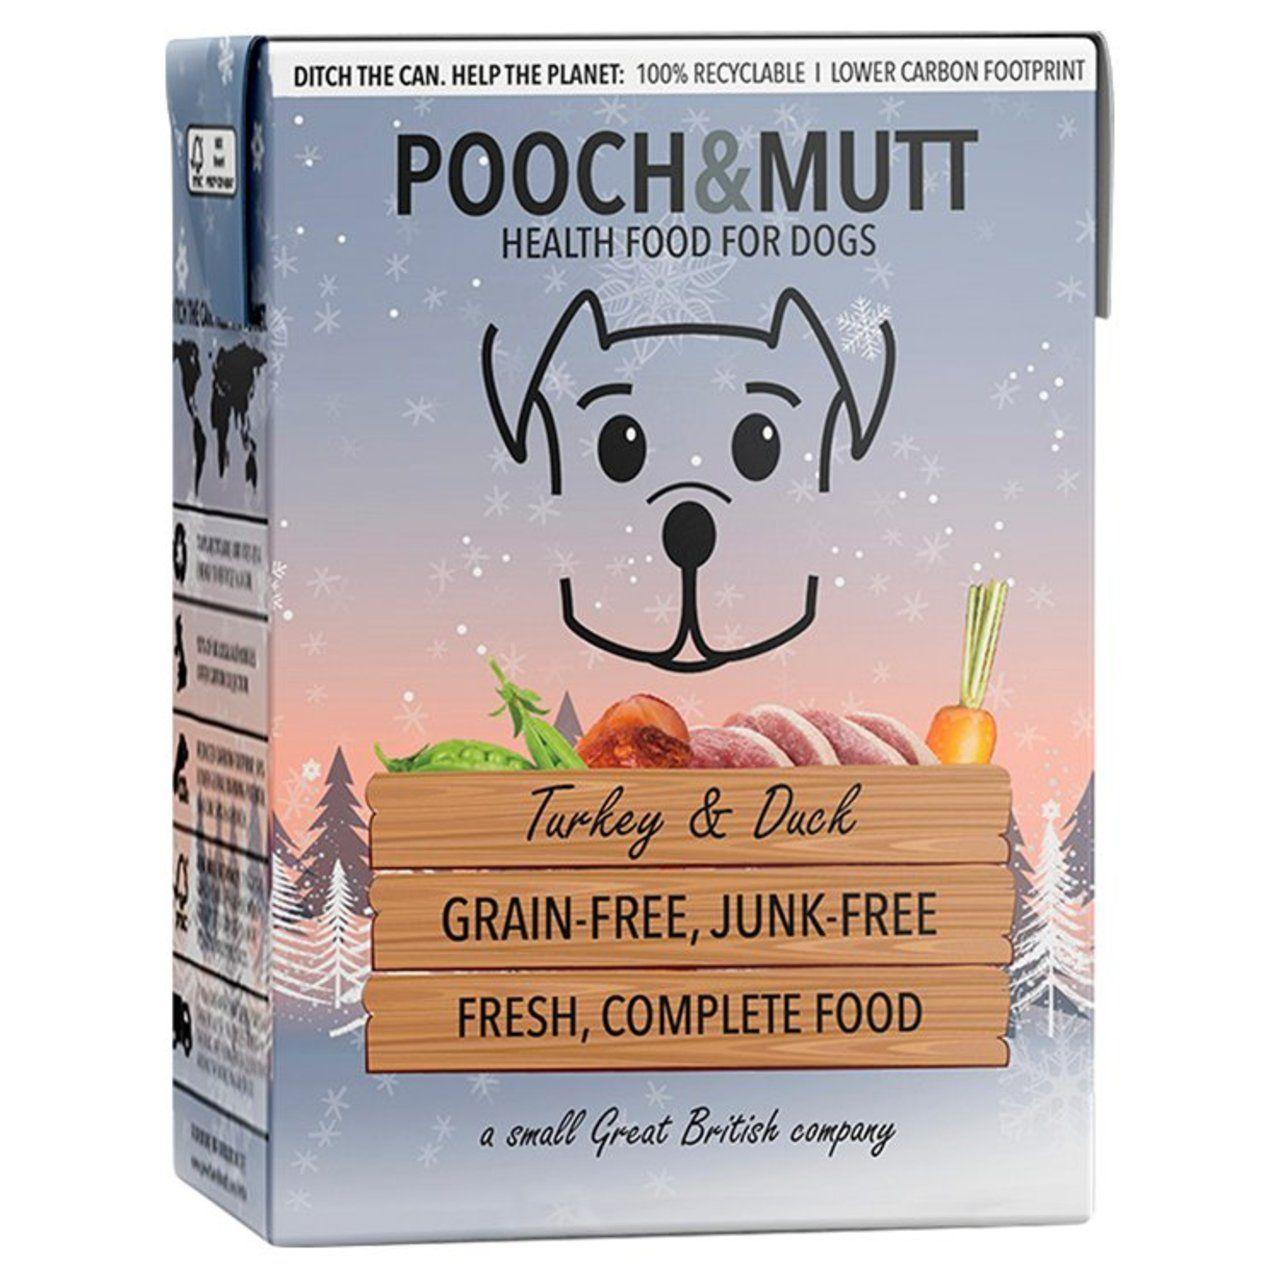 Pin by Emily Challis on Christmas Wet dog food, Dog food